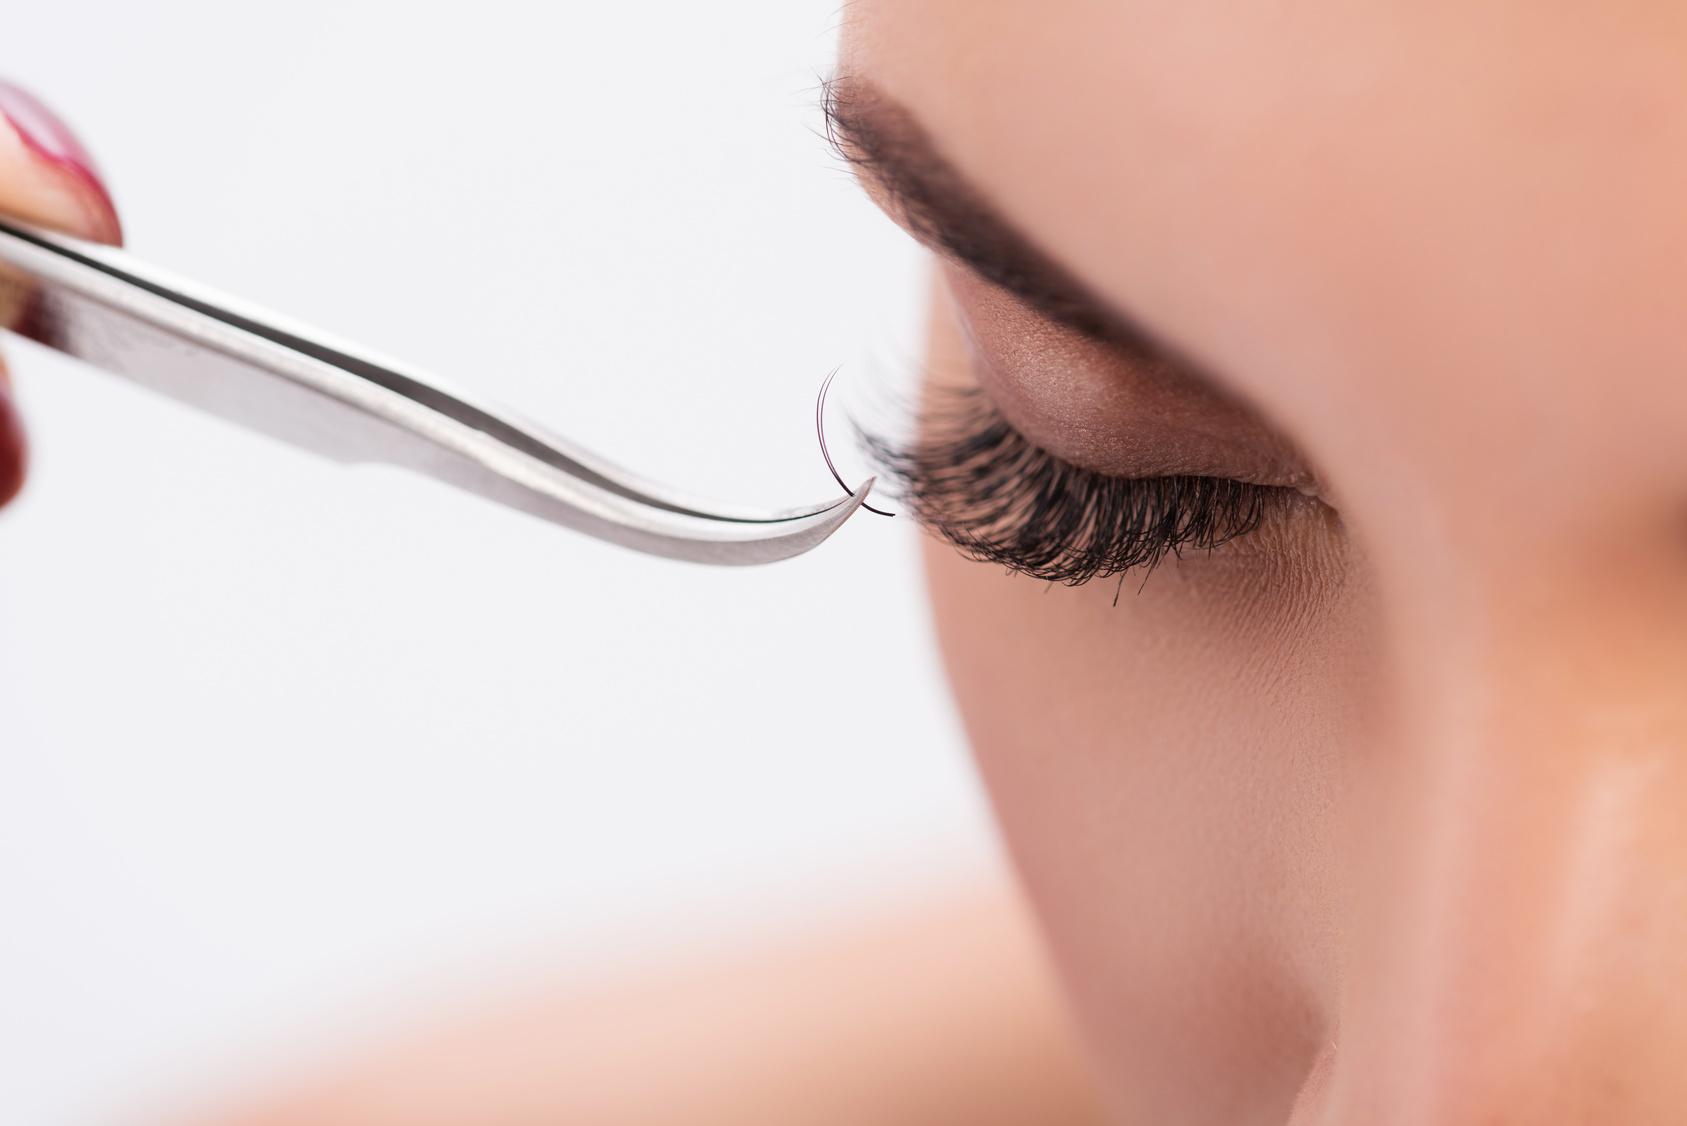 Artificial eyelash growth procedure in details